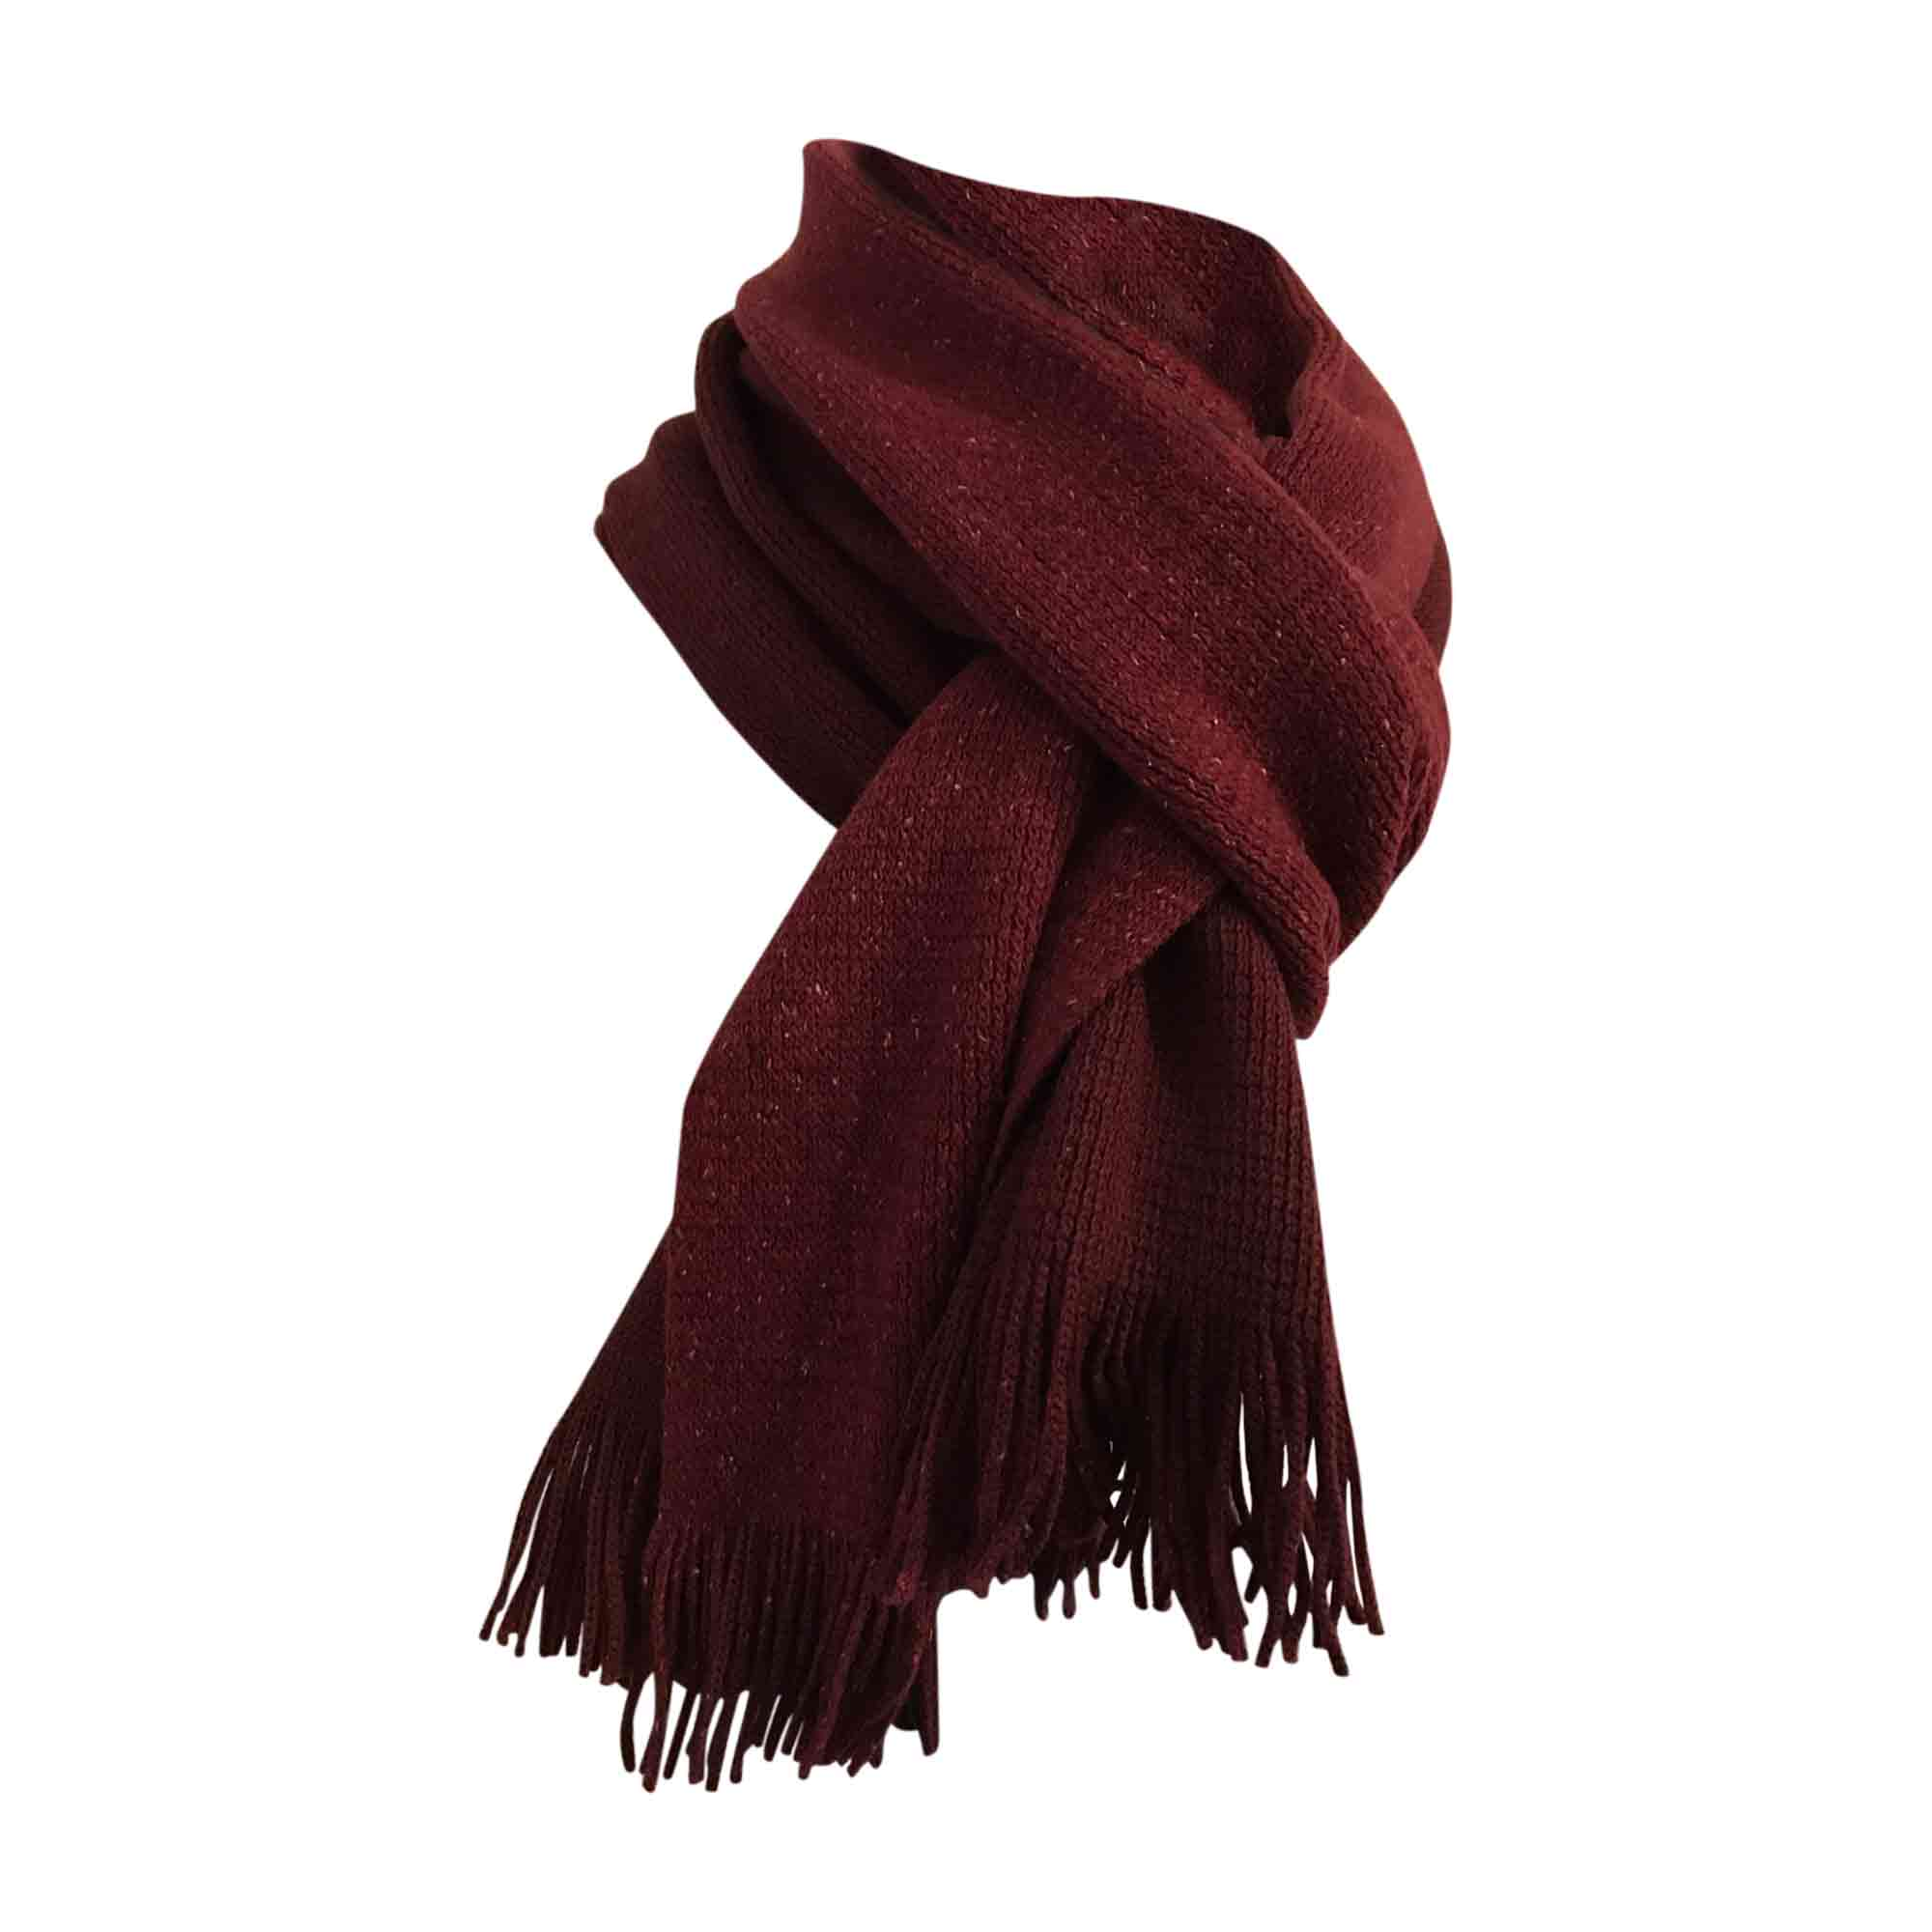 e3d384619a4b Echarpe HUGO BOSS rouge vendu par Dress-code 75 - 5718062